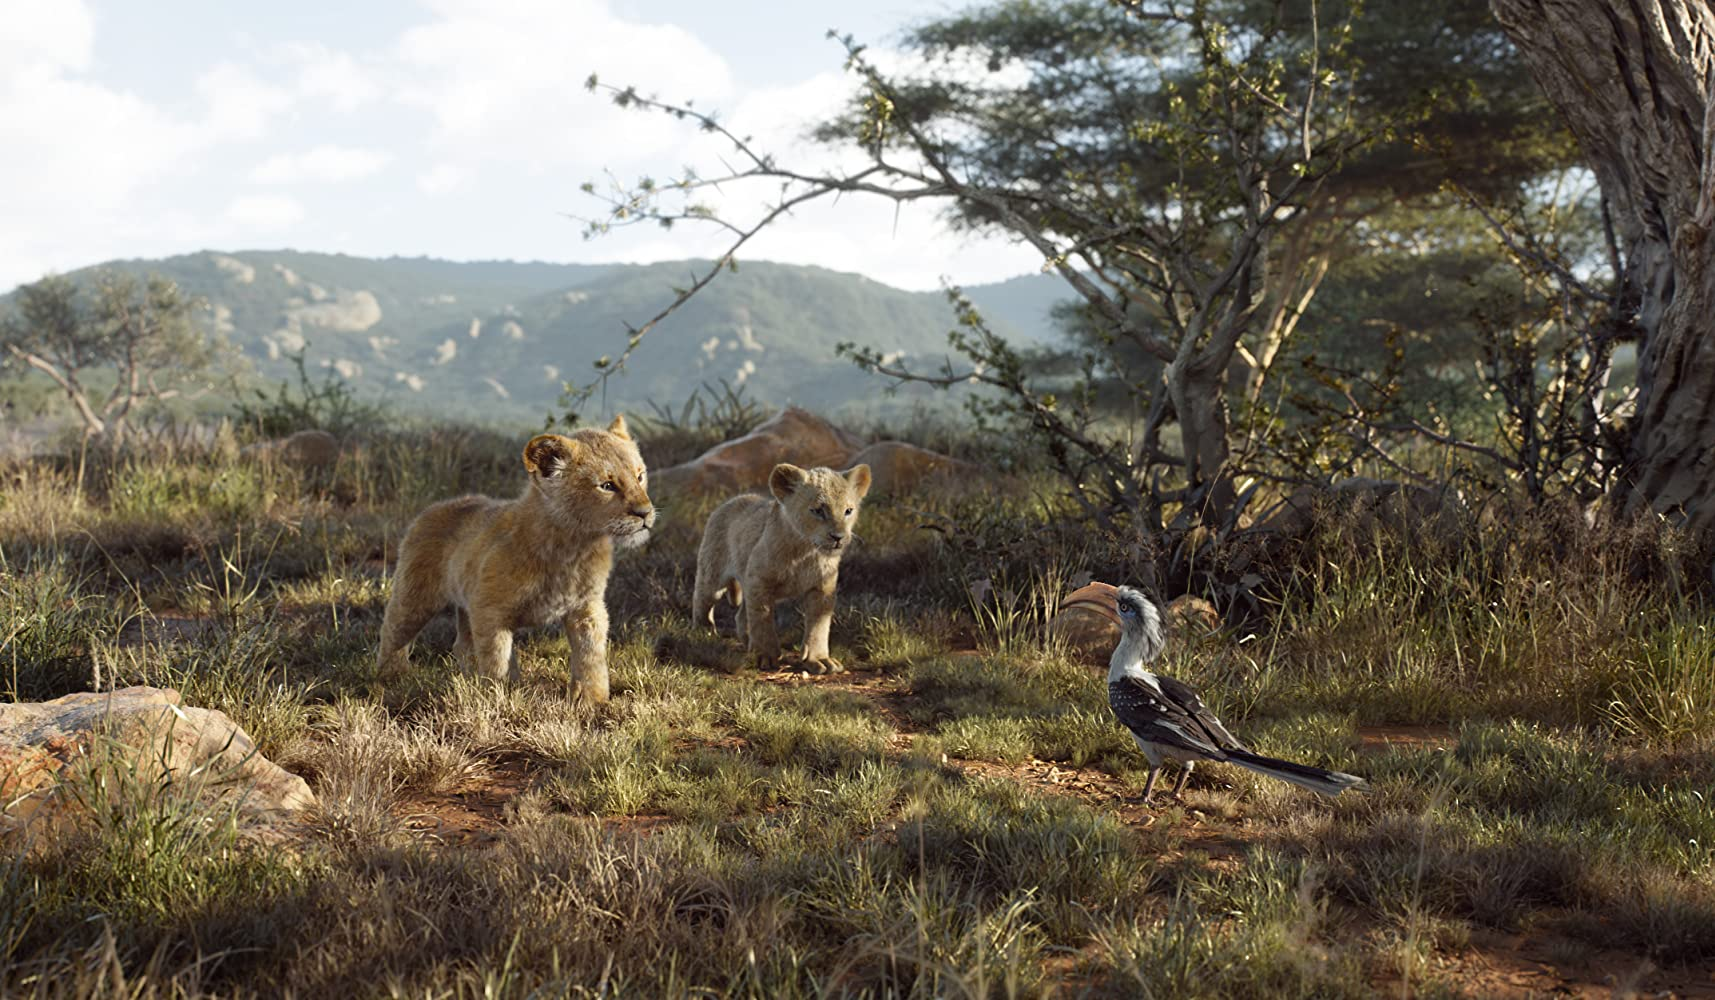 John Oliver, JD McCrary, and Shahadi Wright Joseph in The Lion King (2019)